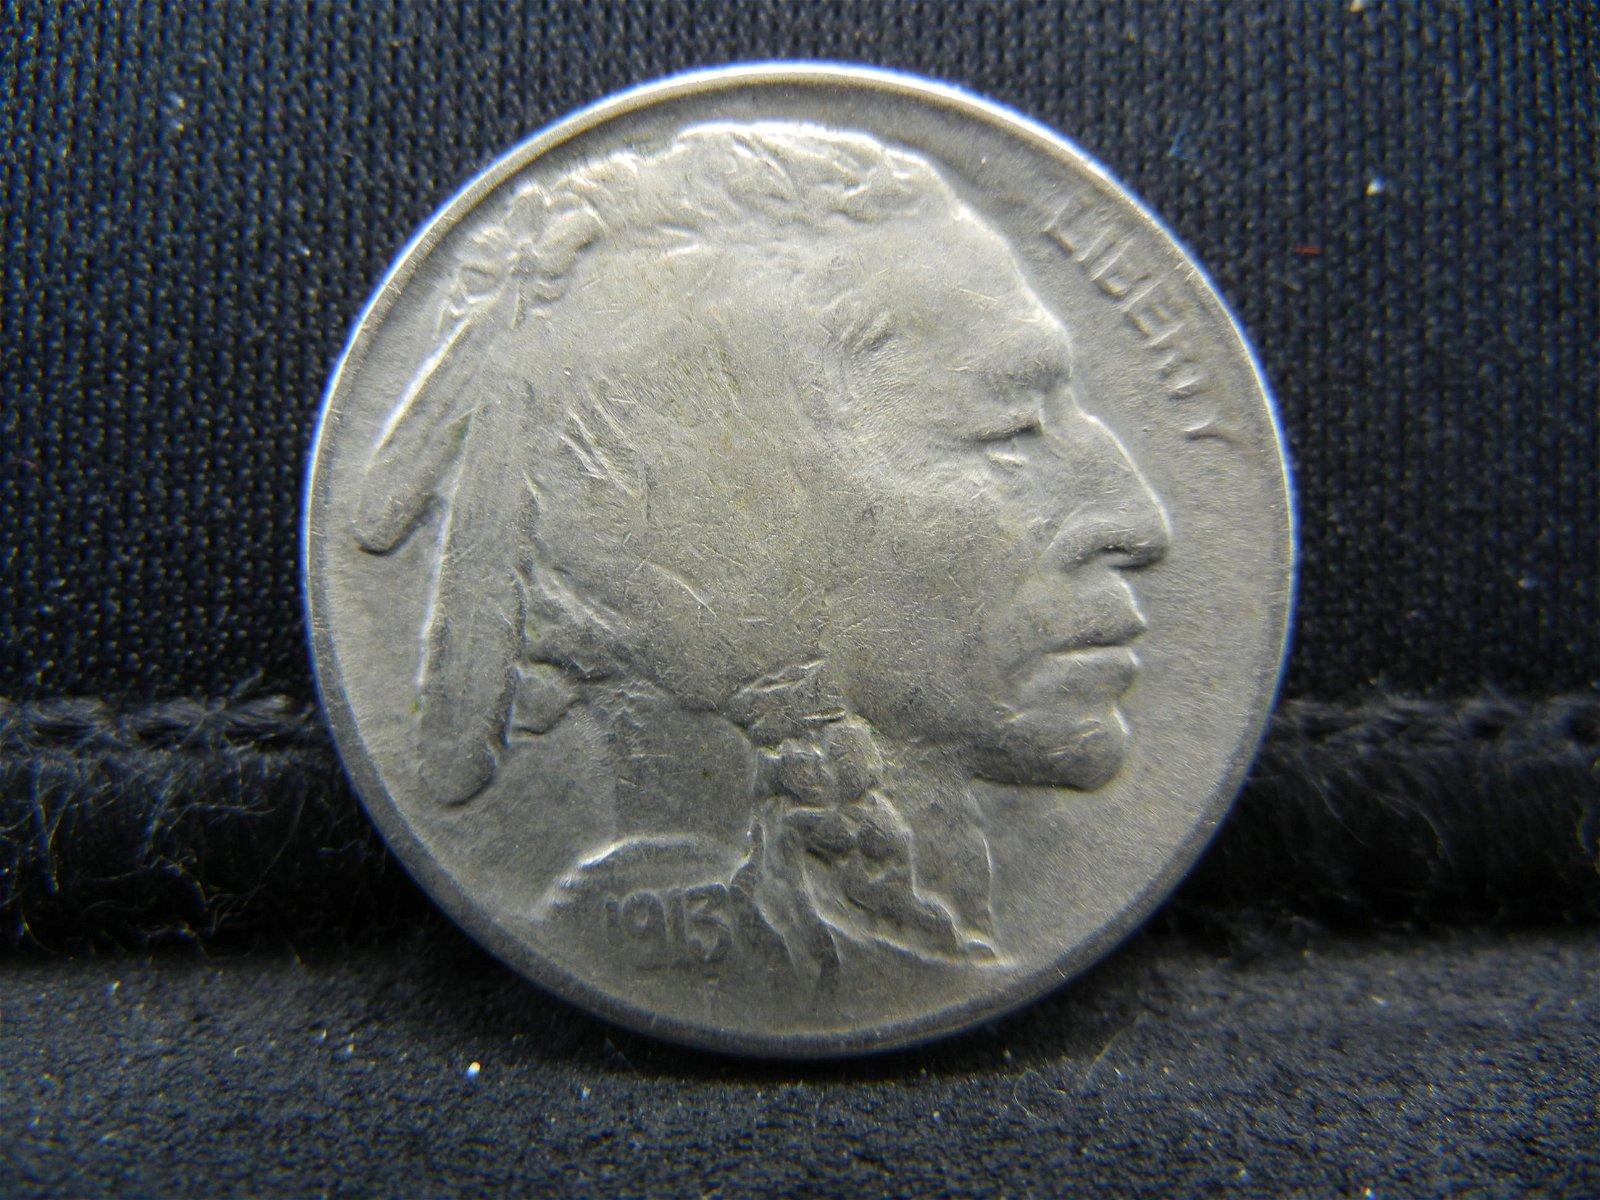 1913 Type 2 United States Buffalo Head Indian Nickel